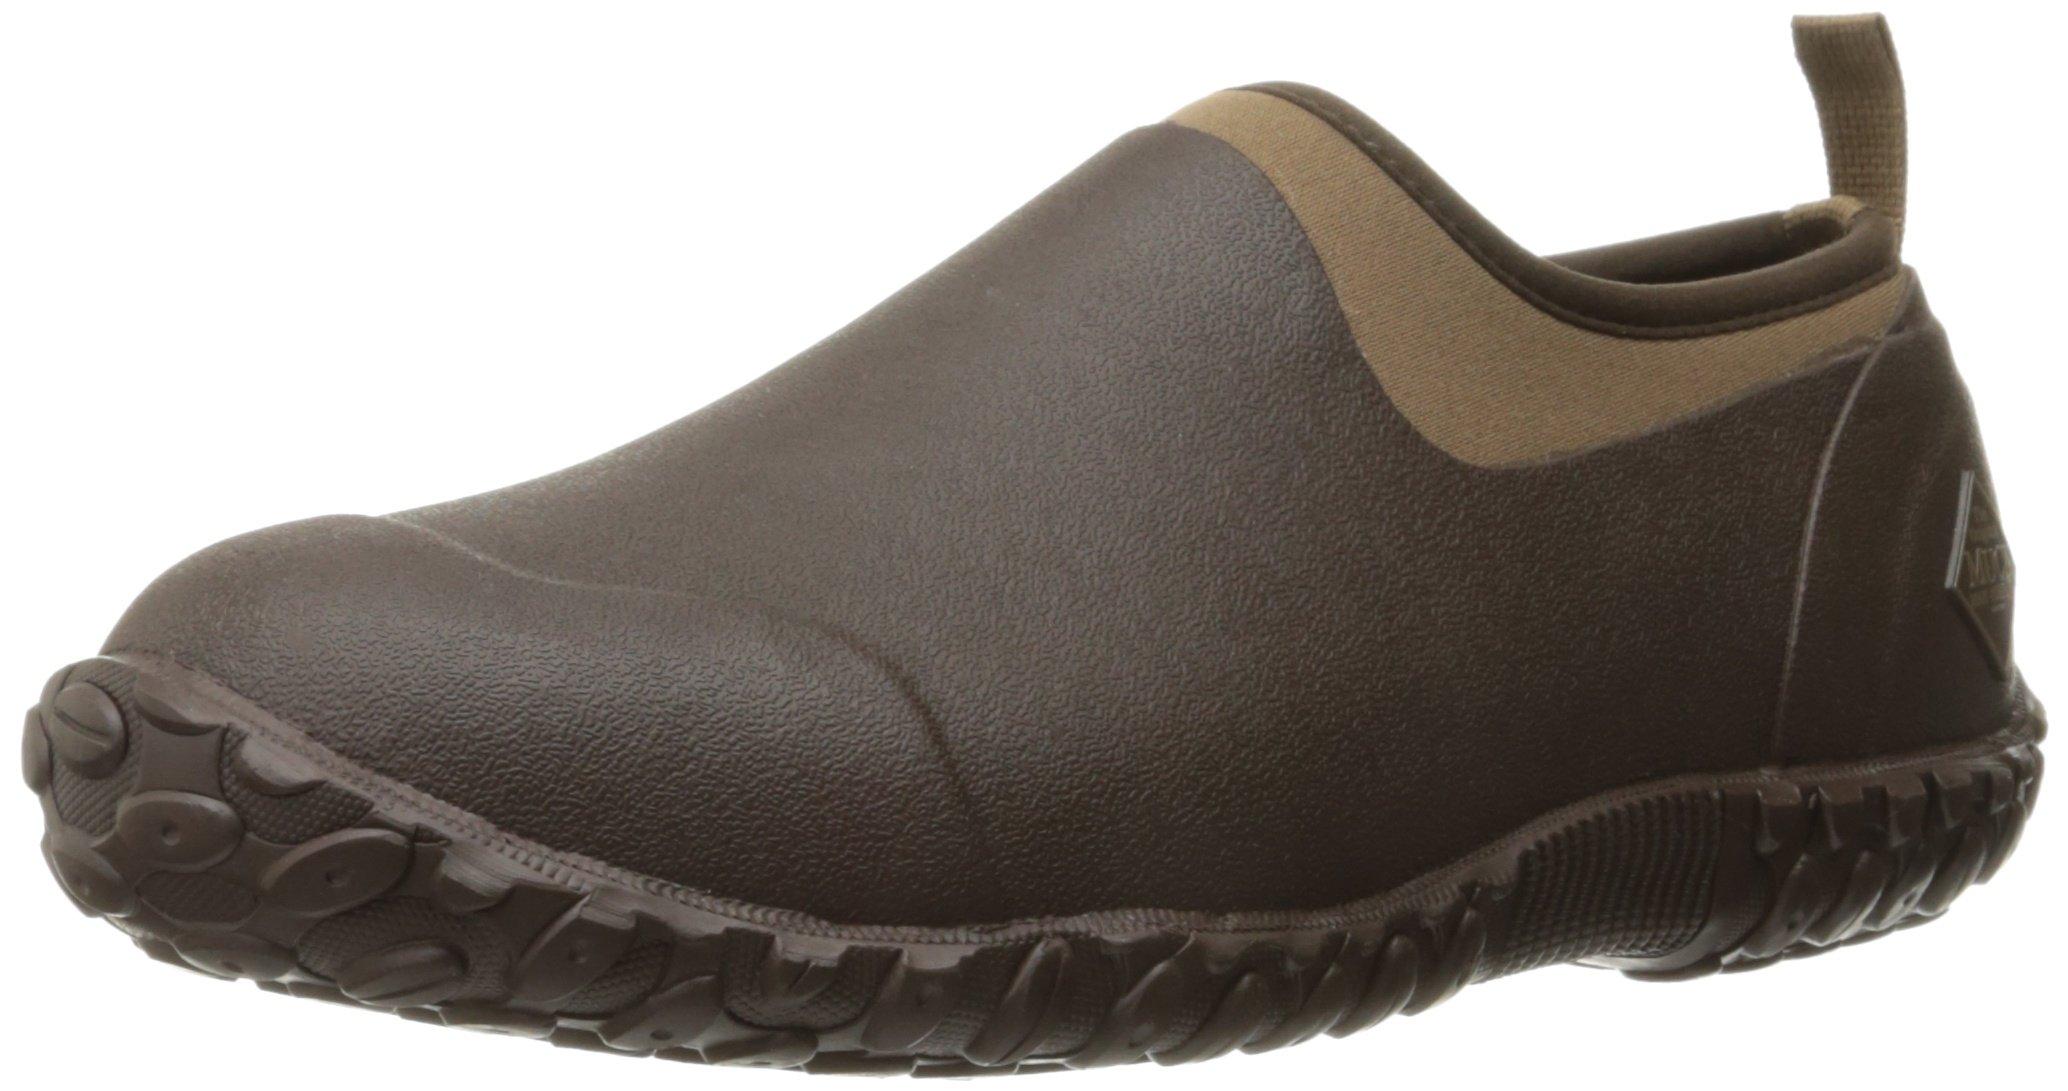 Muckster ll Men's Rubber Garden Shoes,Black/Otter,10 US/10-10.5 M US by Muck Boot